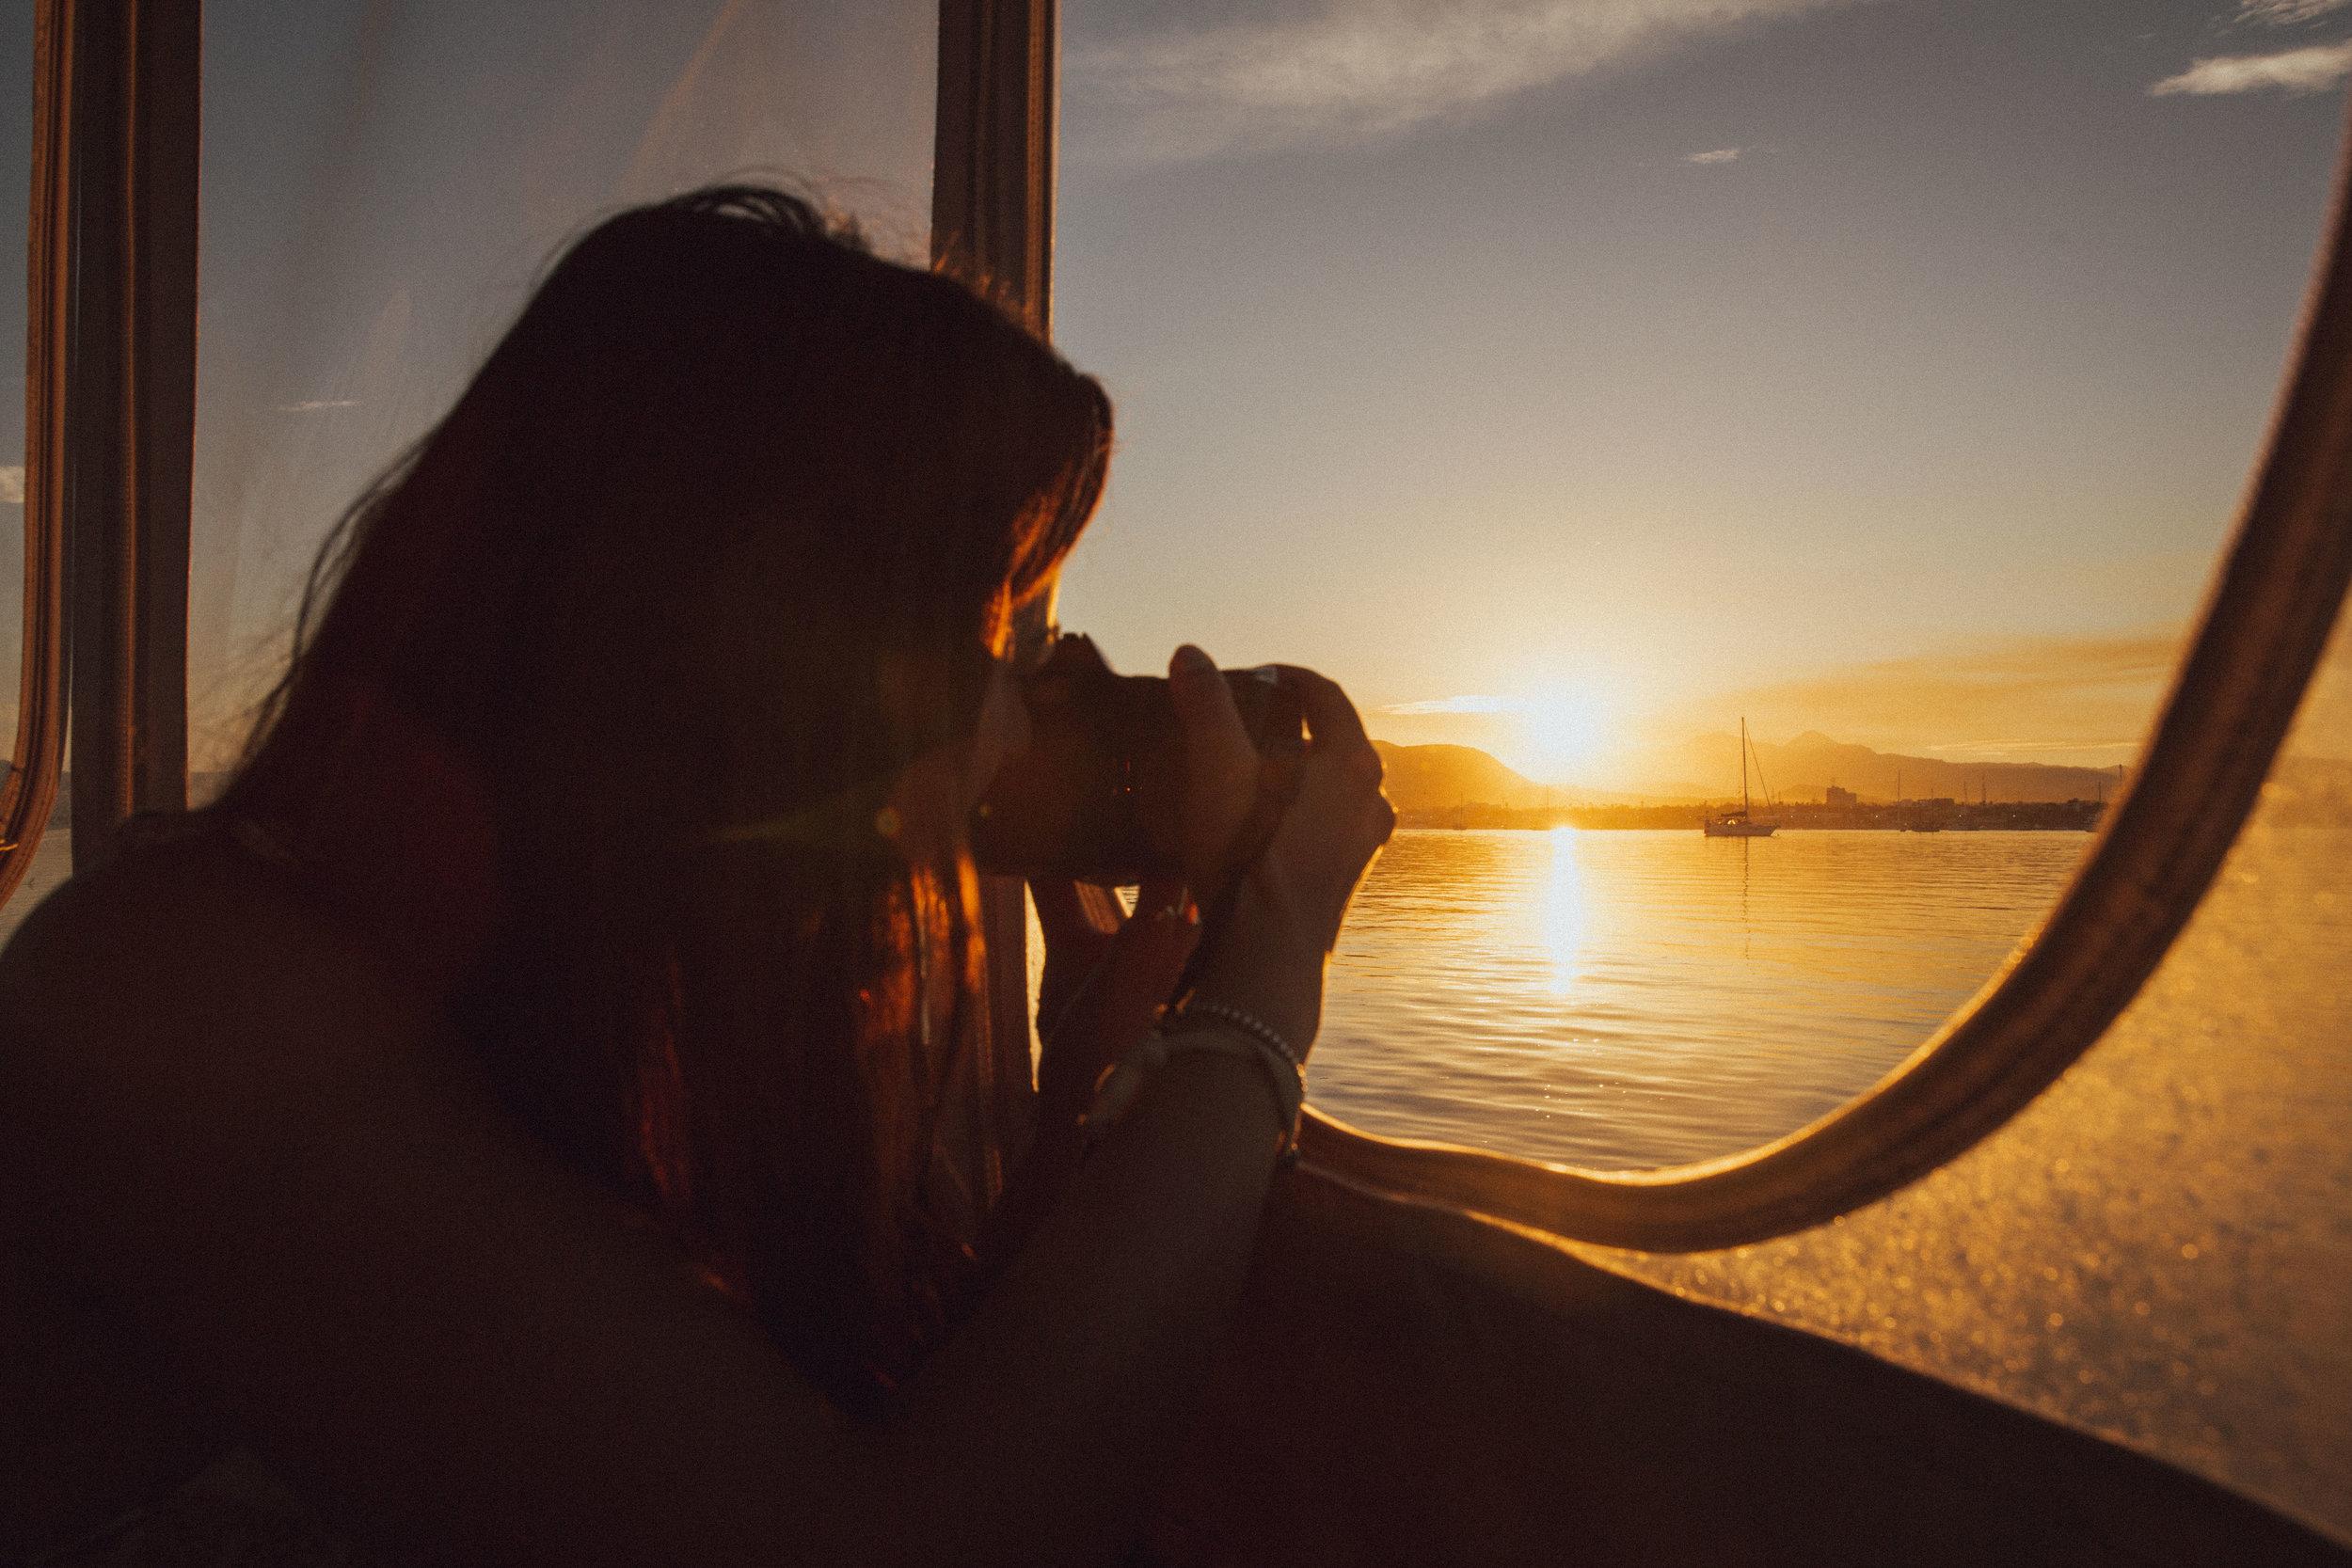 samlandreth-allegraroseb-mexico-sunrise-boat